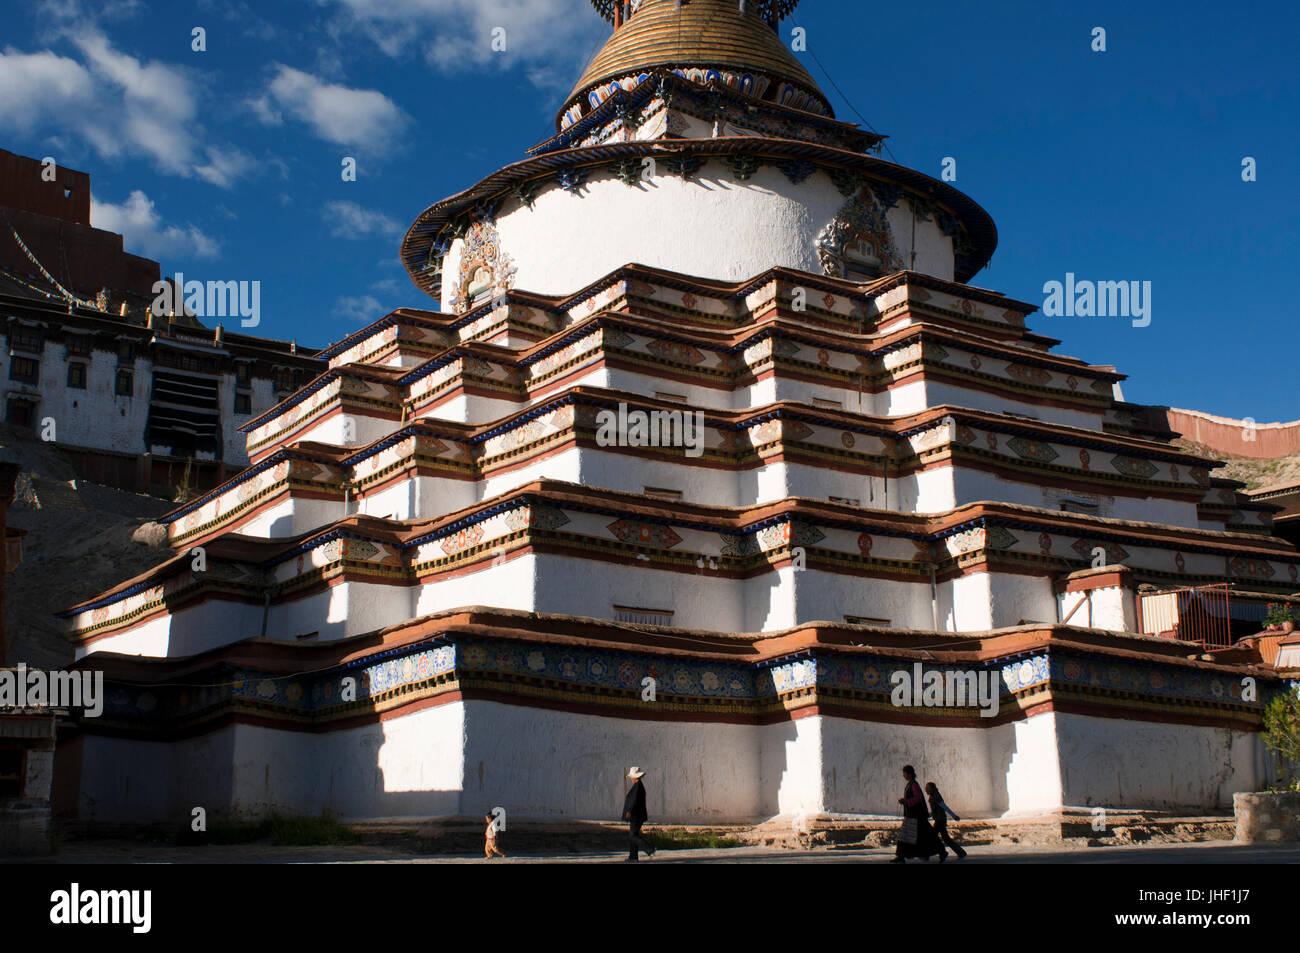 Kumbum stupa in the monastery Paelkhor, Pelkhor Chode, Gyangze, Tibet, China, Asia - Stock Image